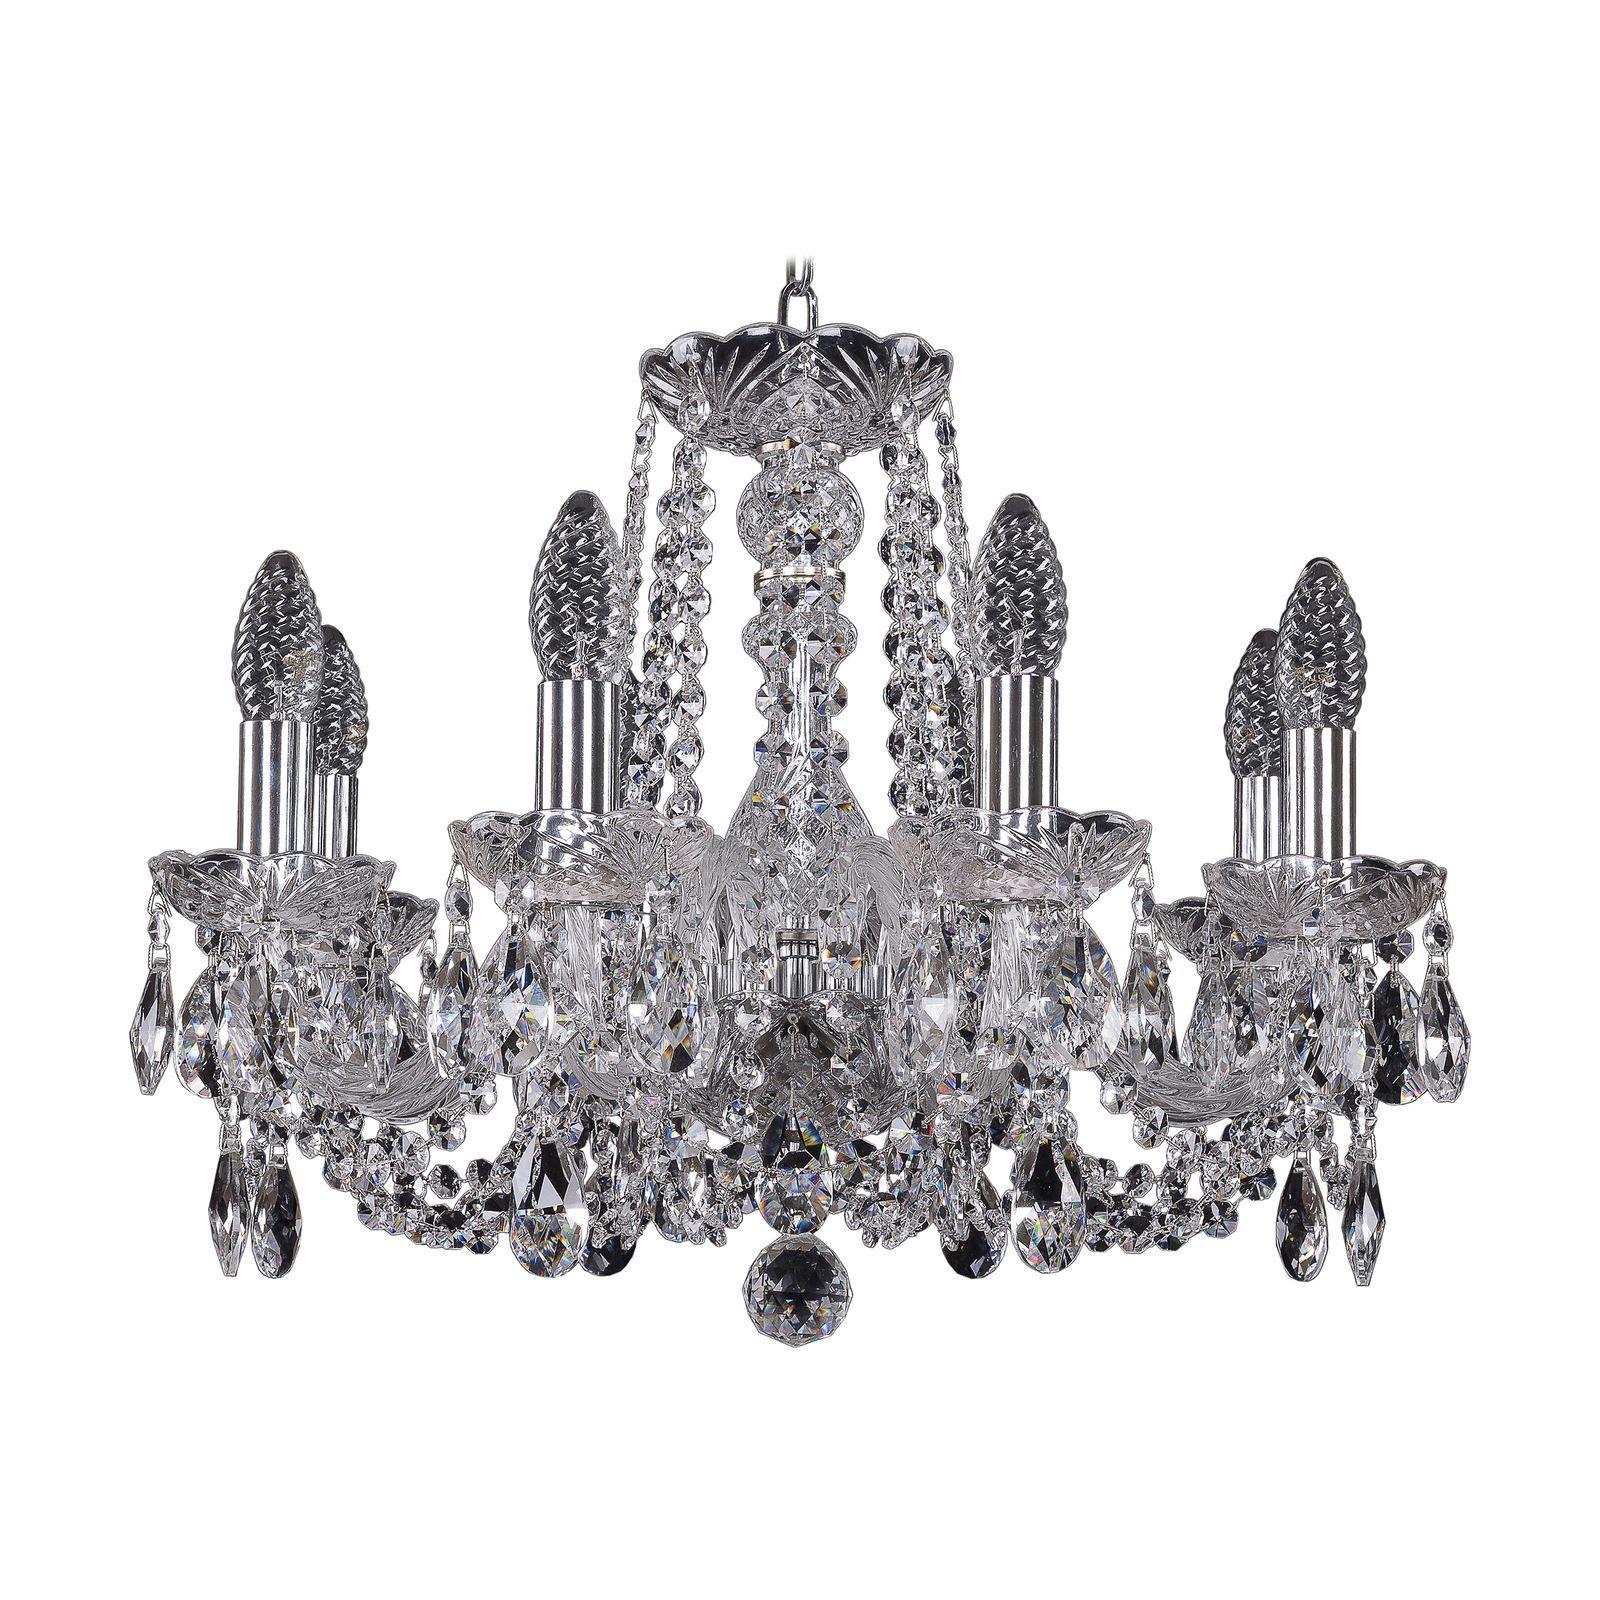 Потолочный светильник Bohemia Ivele Crystal 1402/8/160 Ni, E14, 40 Вт bohemia ivele crystal 1932 75z g